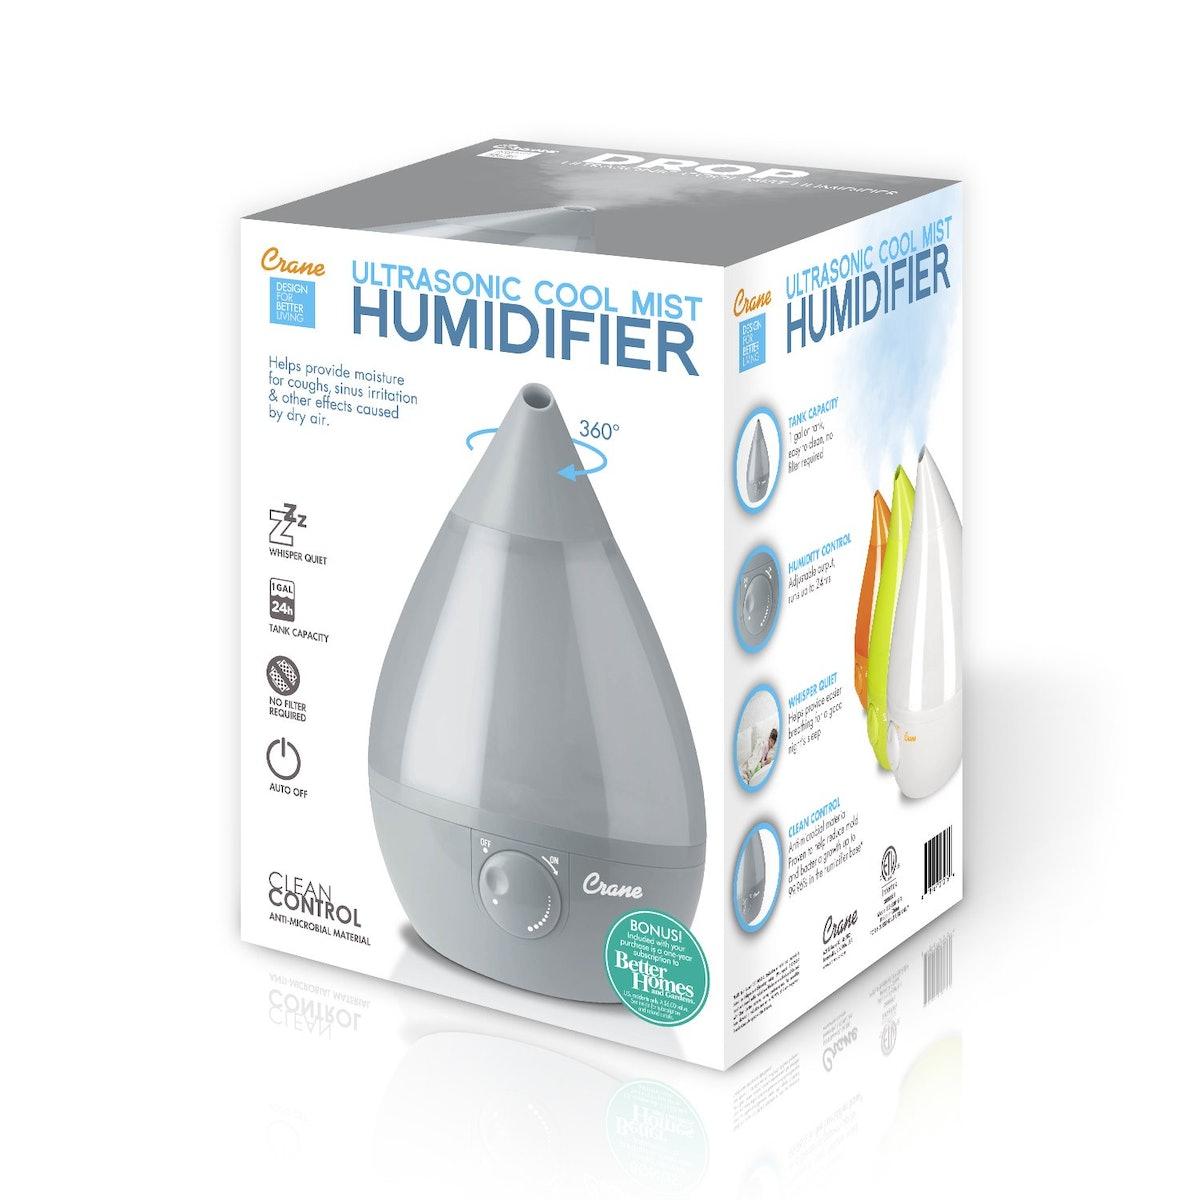 Ultrasonic Cool Mist Humidifier, Filter-Free